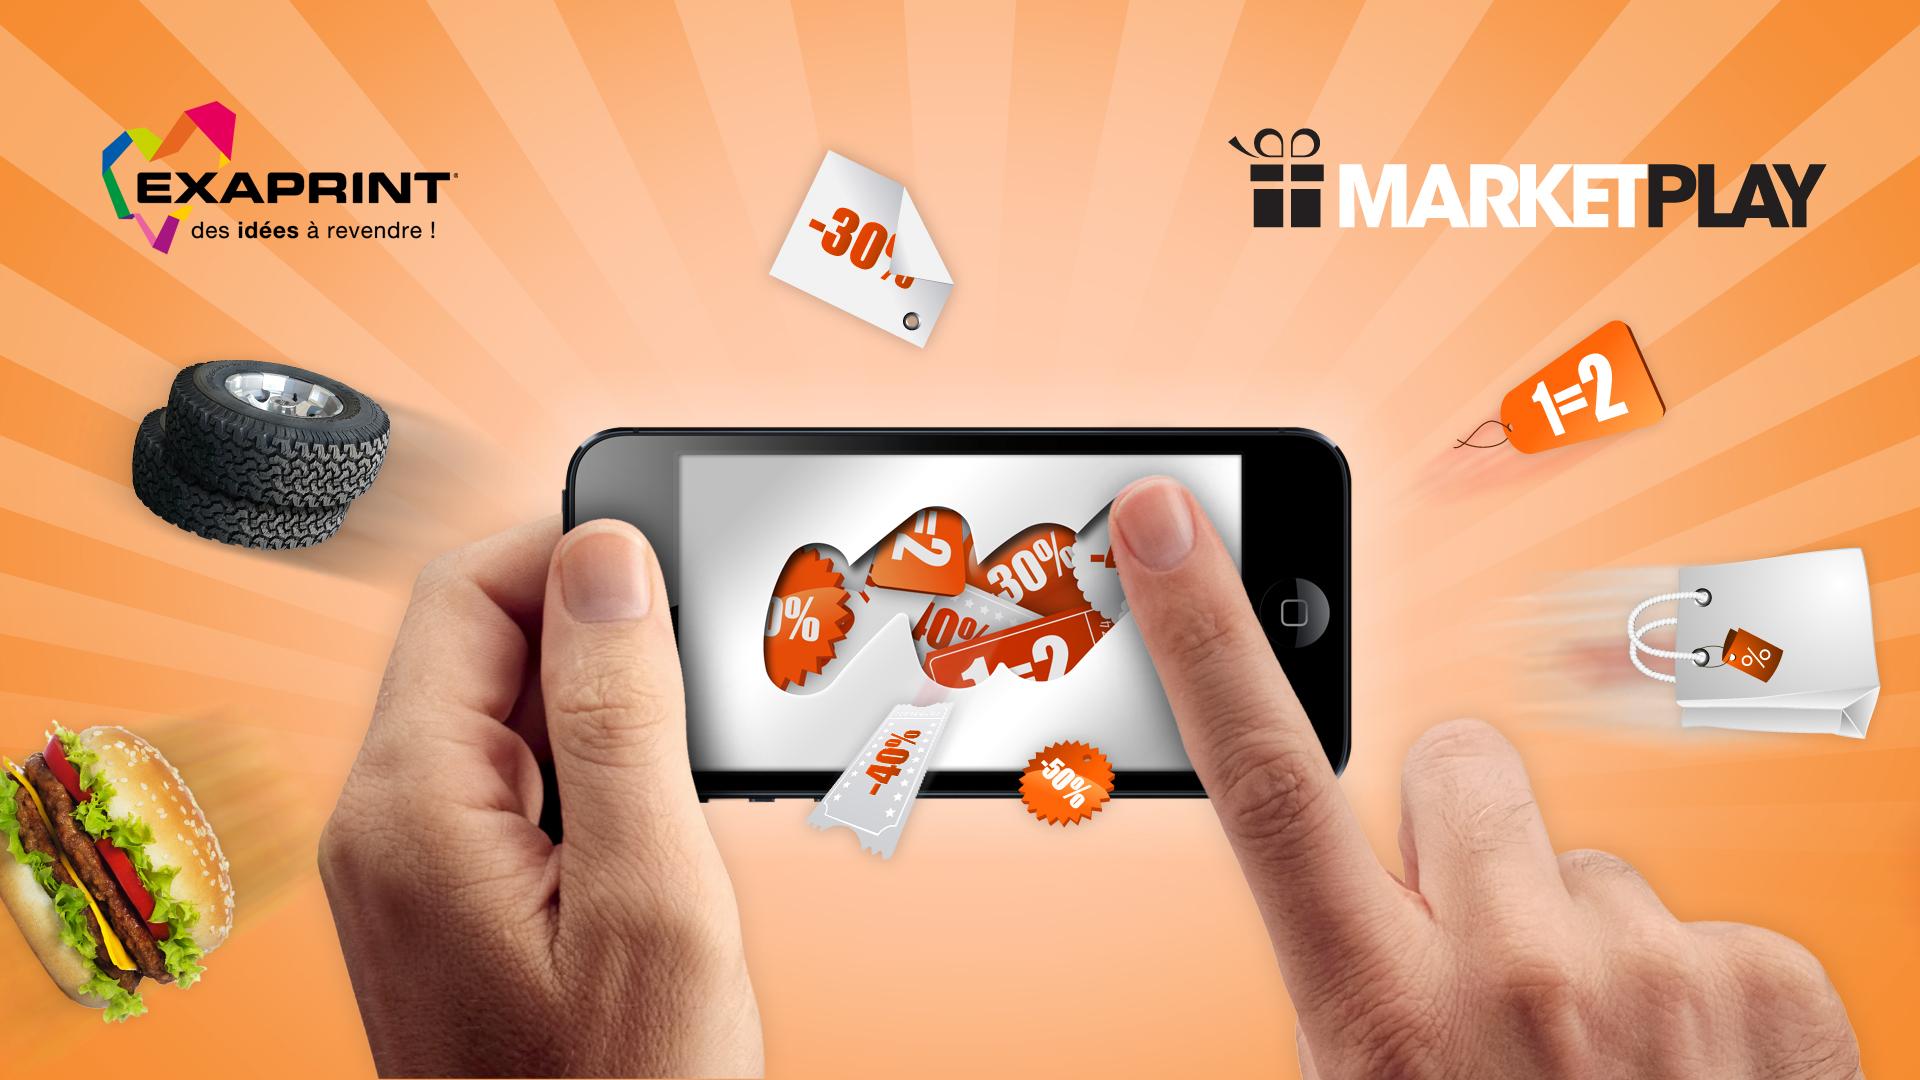 exaprint-marketplay-creation-concept-visuel-mailing-site-motion-video-communication-caconcept-alexis-cretin-graphiste-montpellier